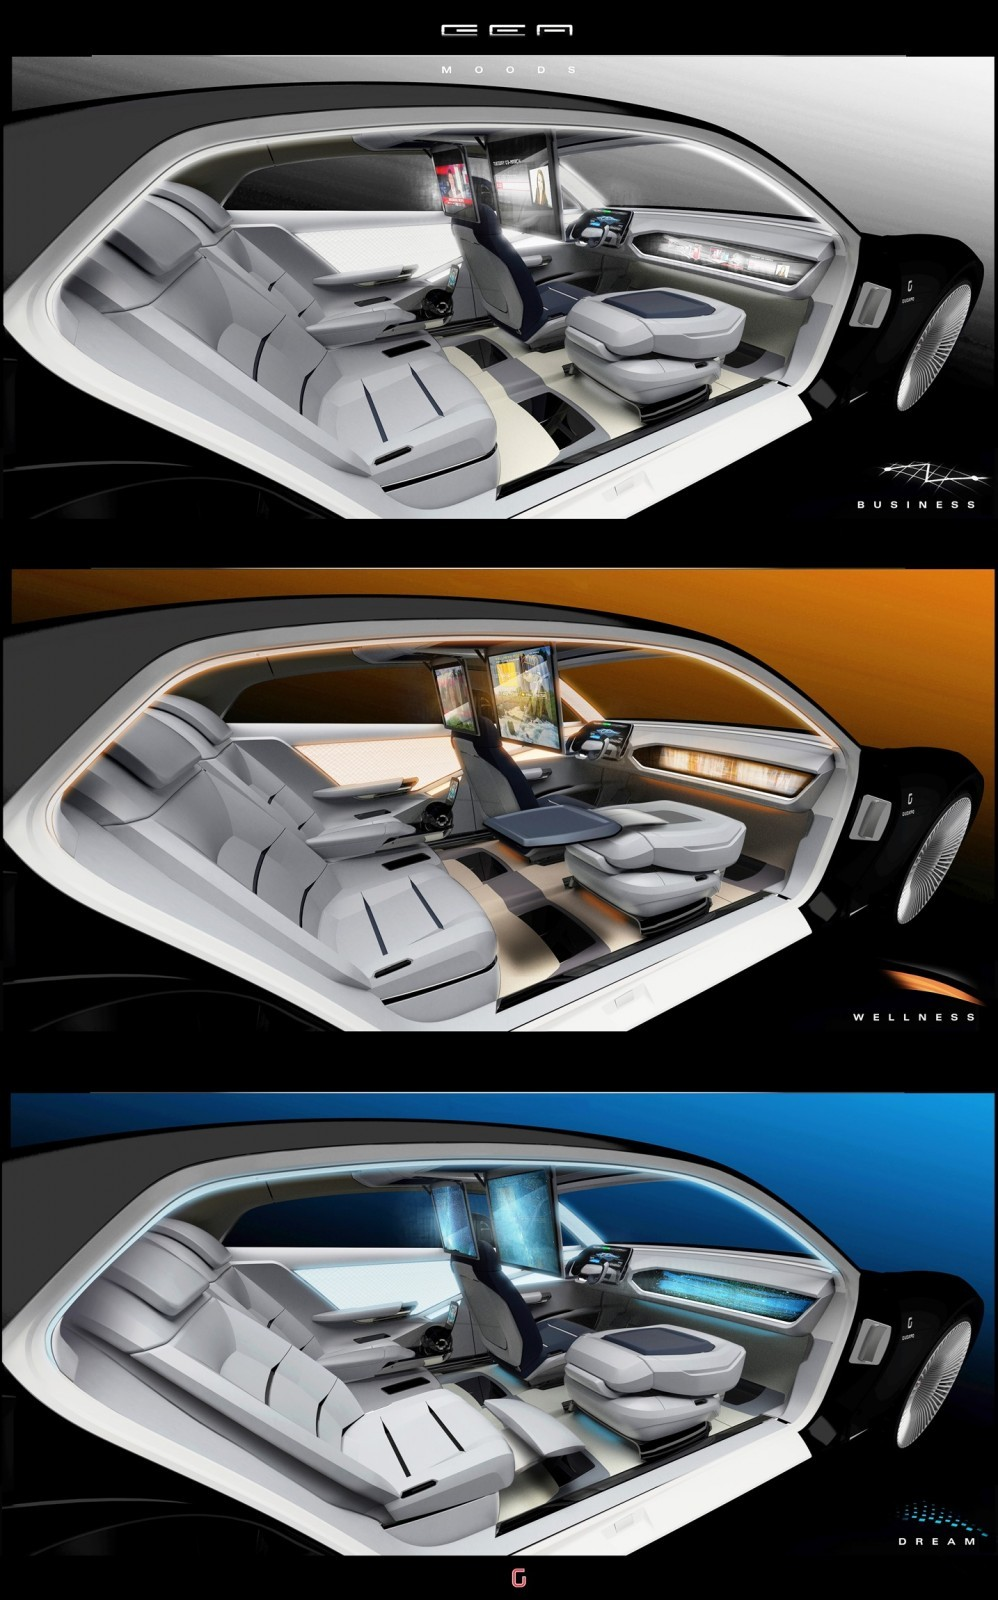 2015 ItalDesign Giugiaro GEA Concept 15